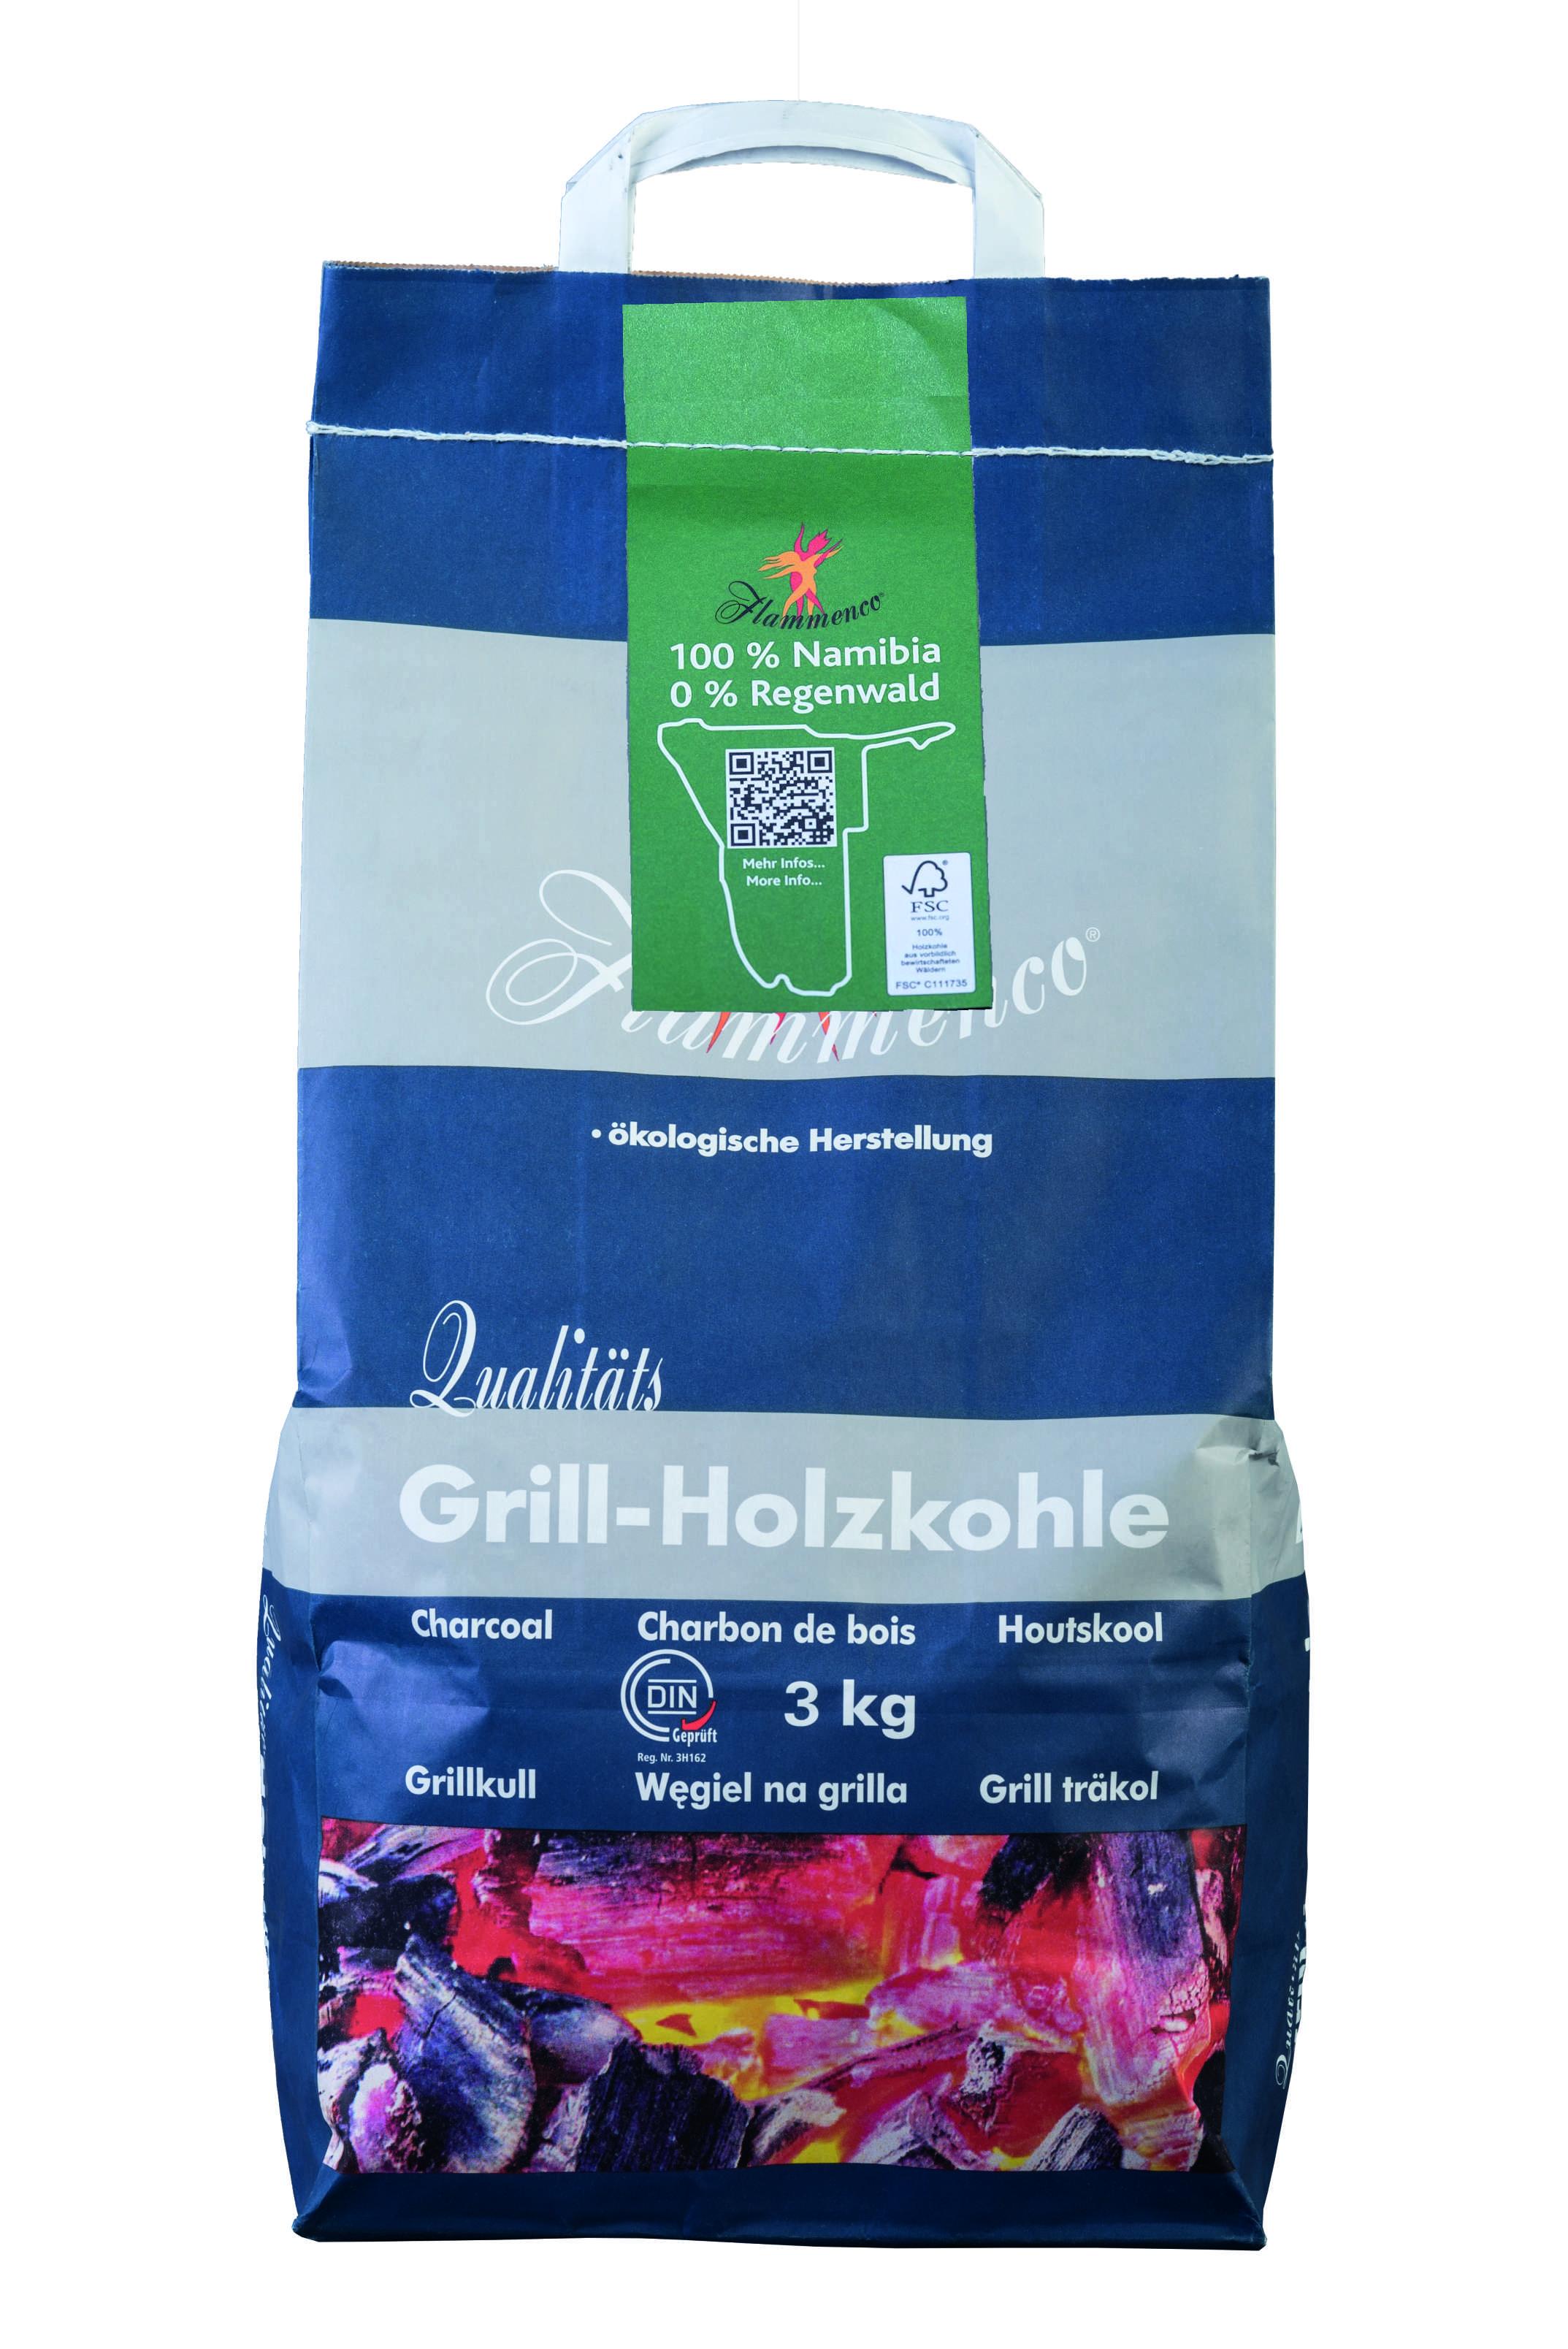 Grillholzkohle 2,5 Kg-Sack Premium 10 x 2,5kg